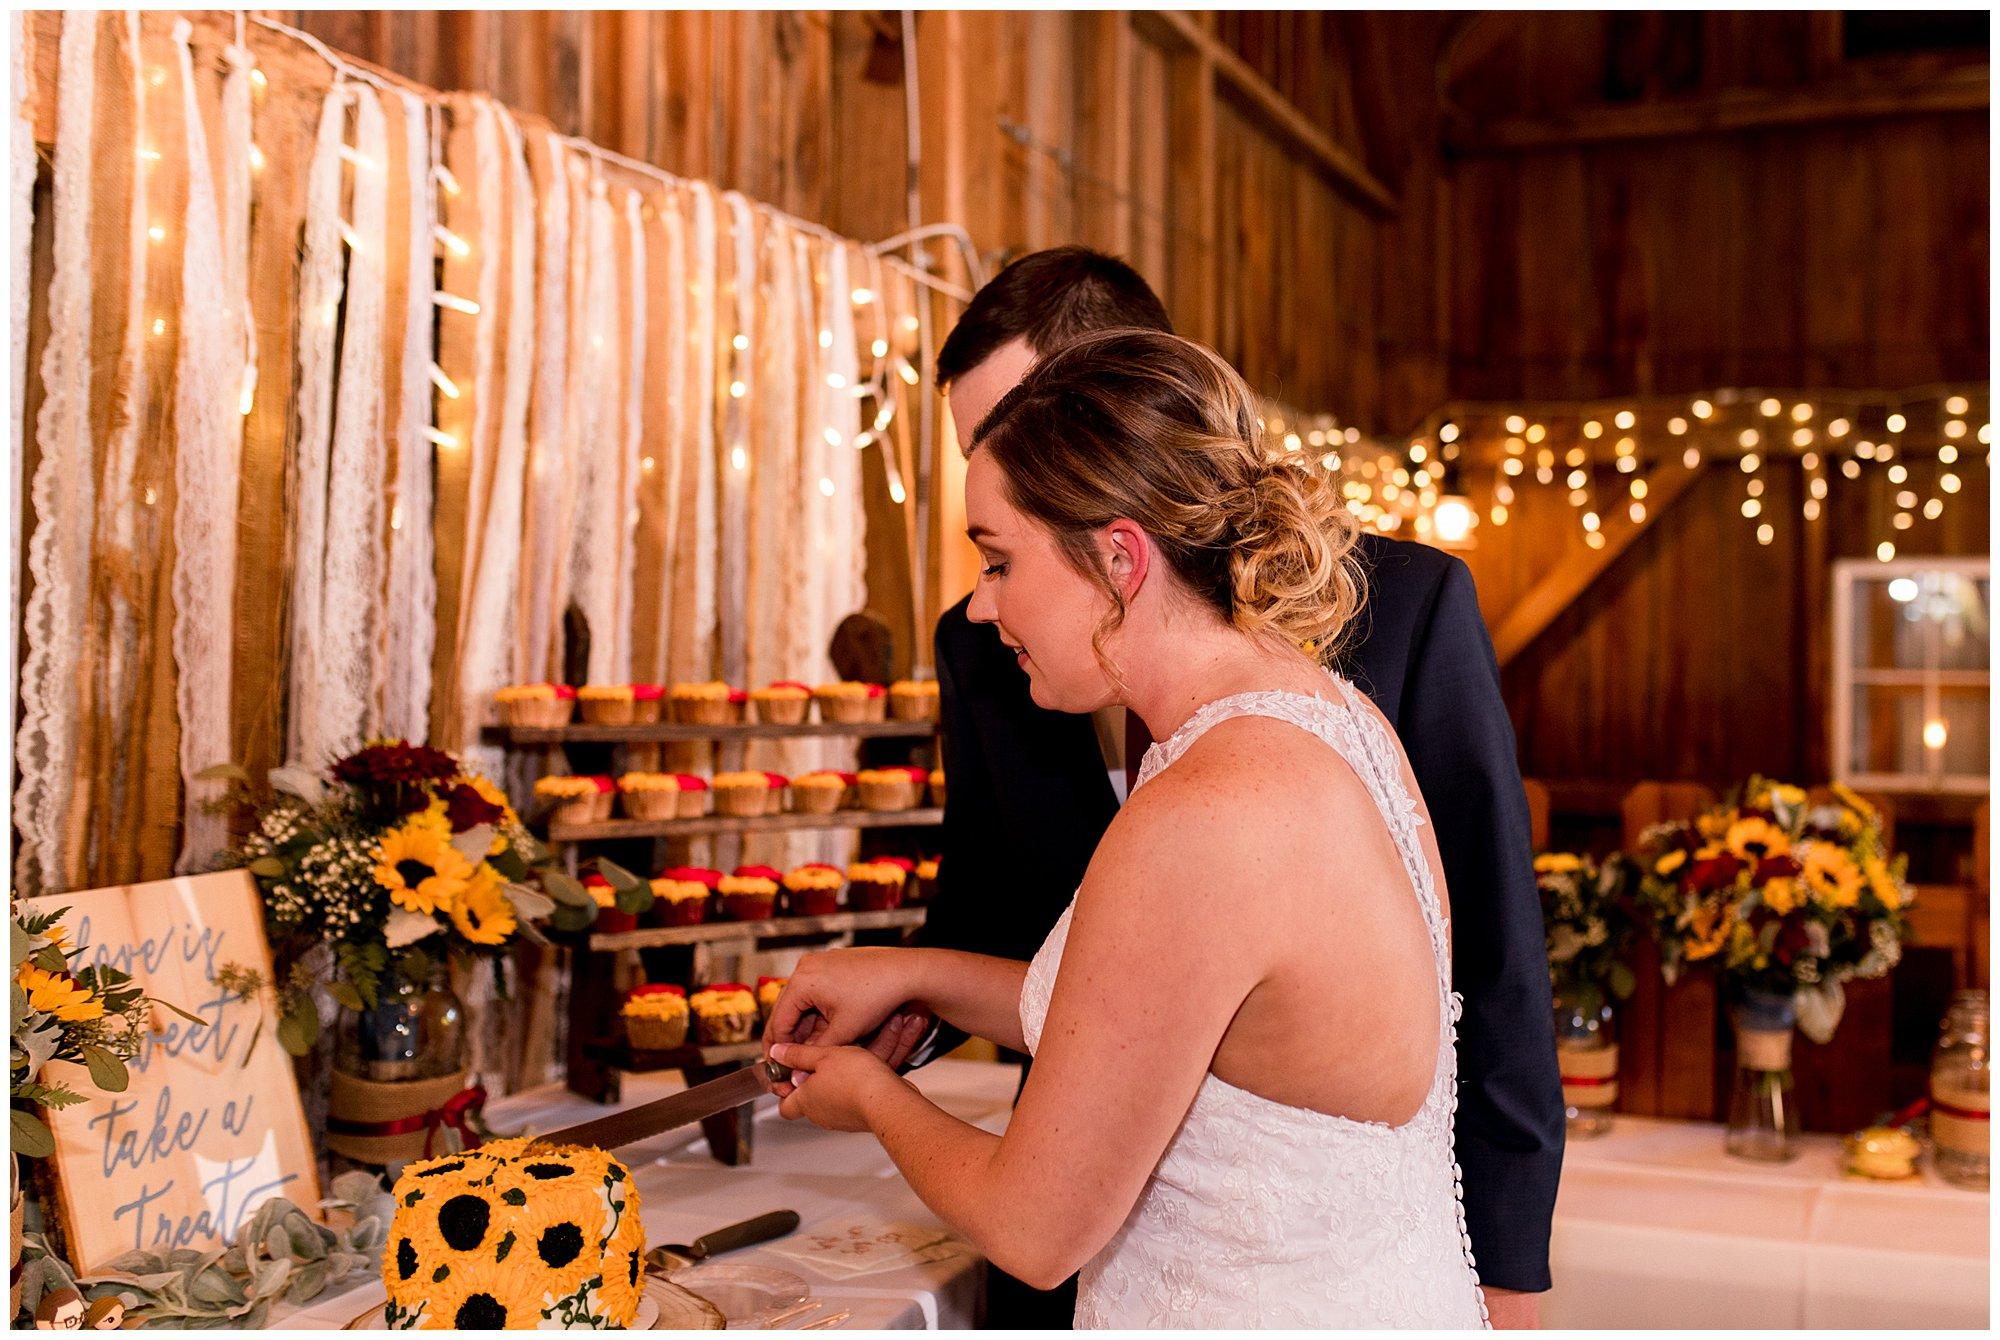 bride and groom cut cake together at Legacy Barn wedding reception in Kokomo